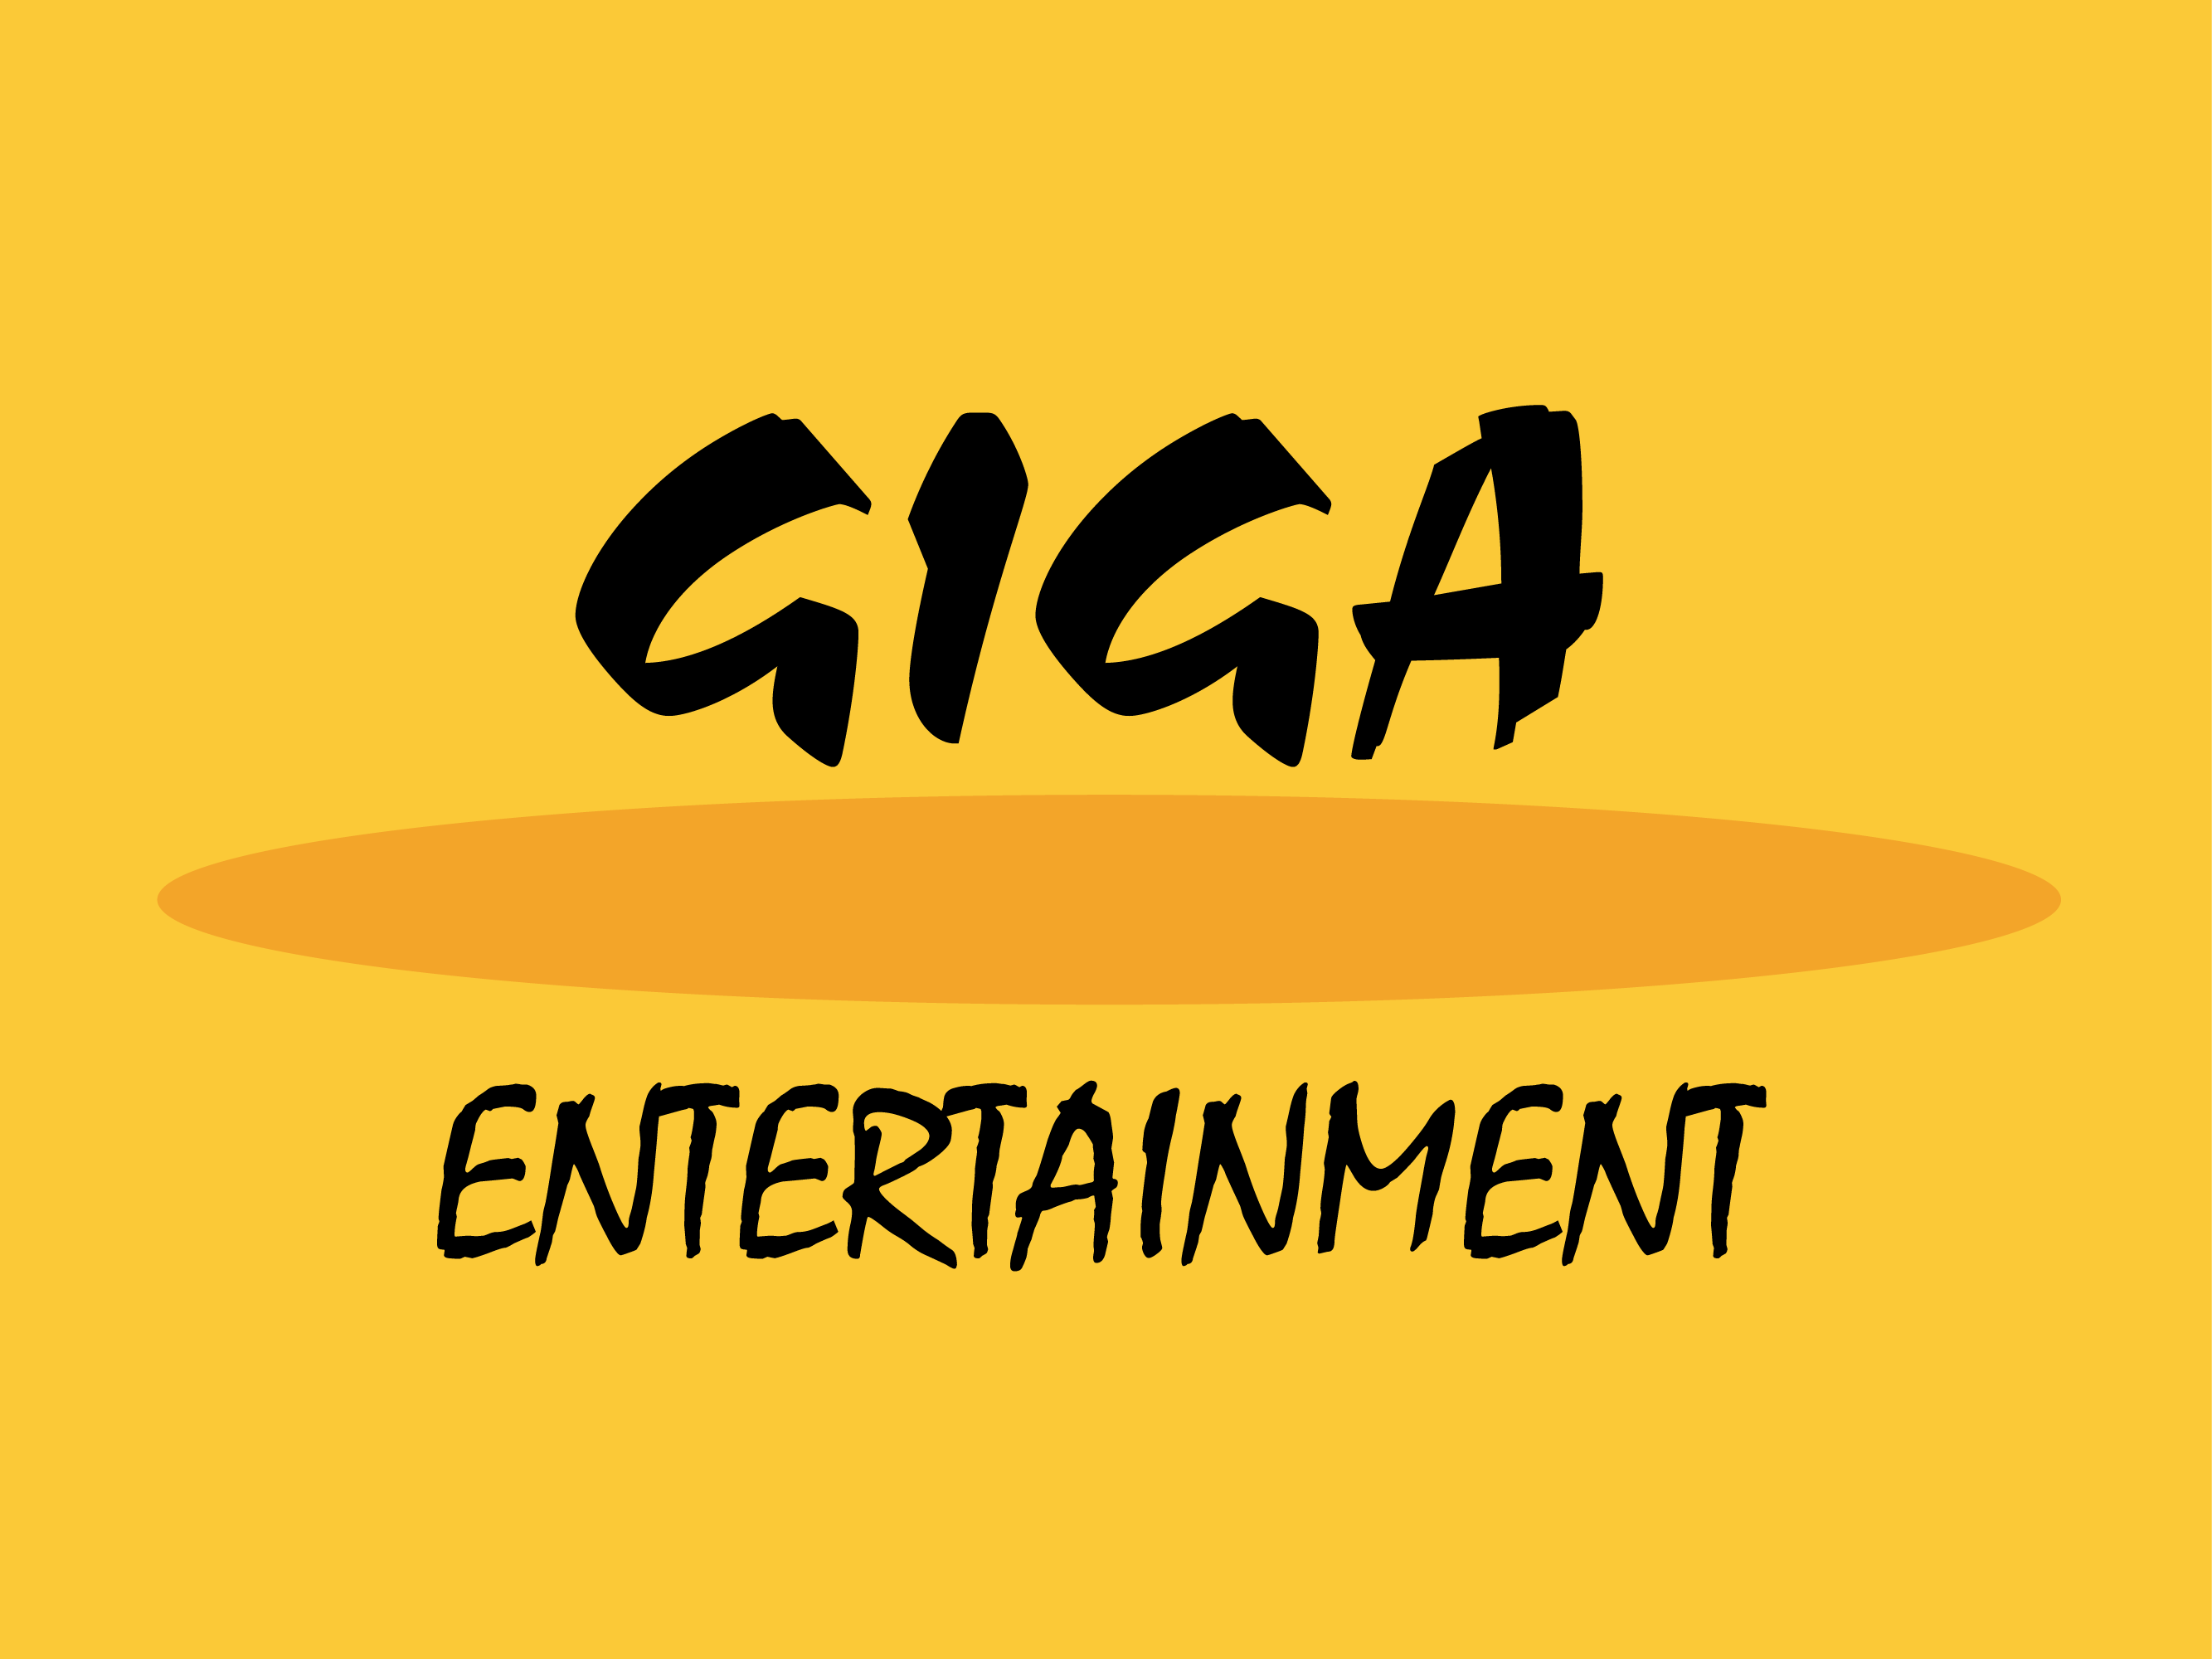 giga-1